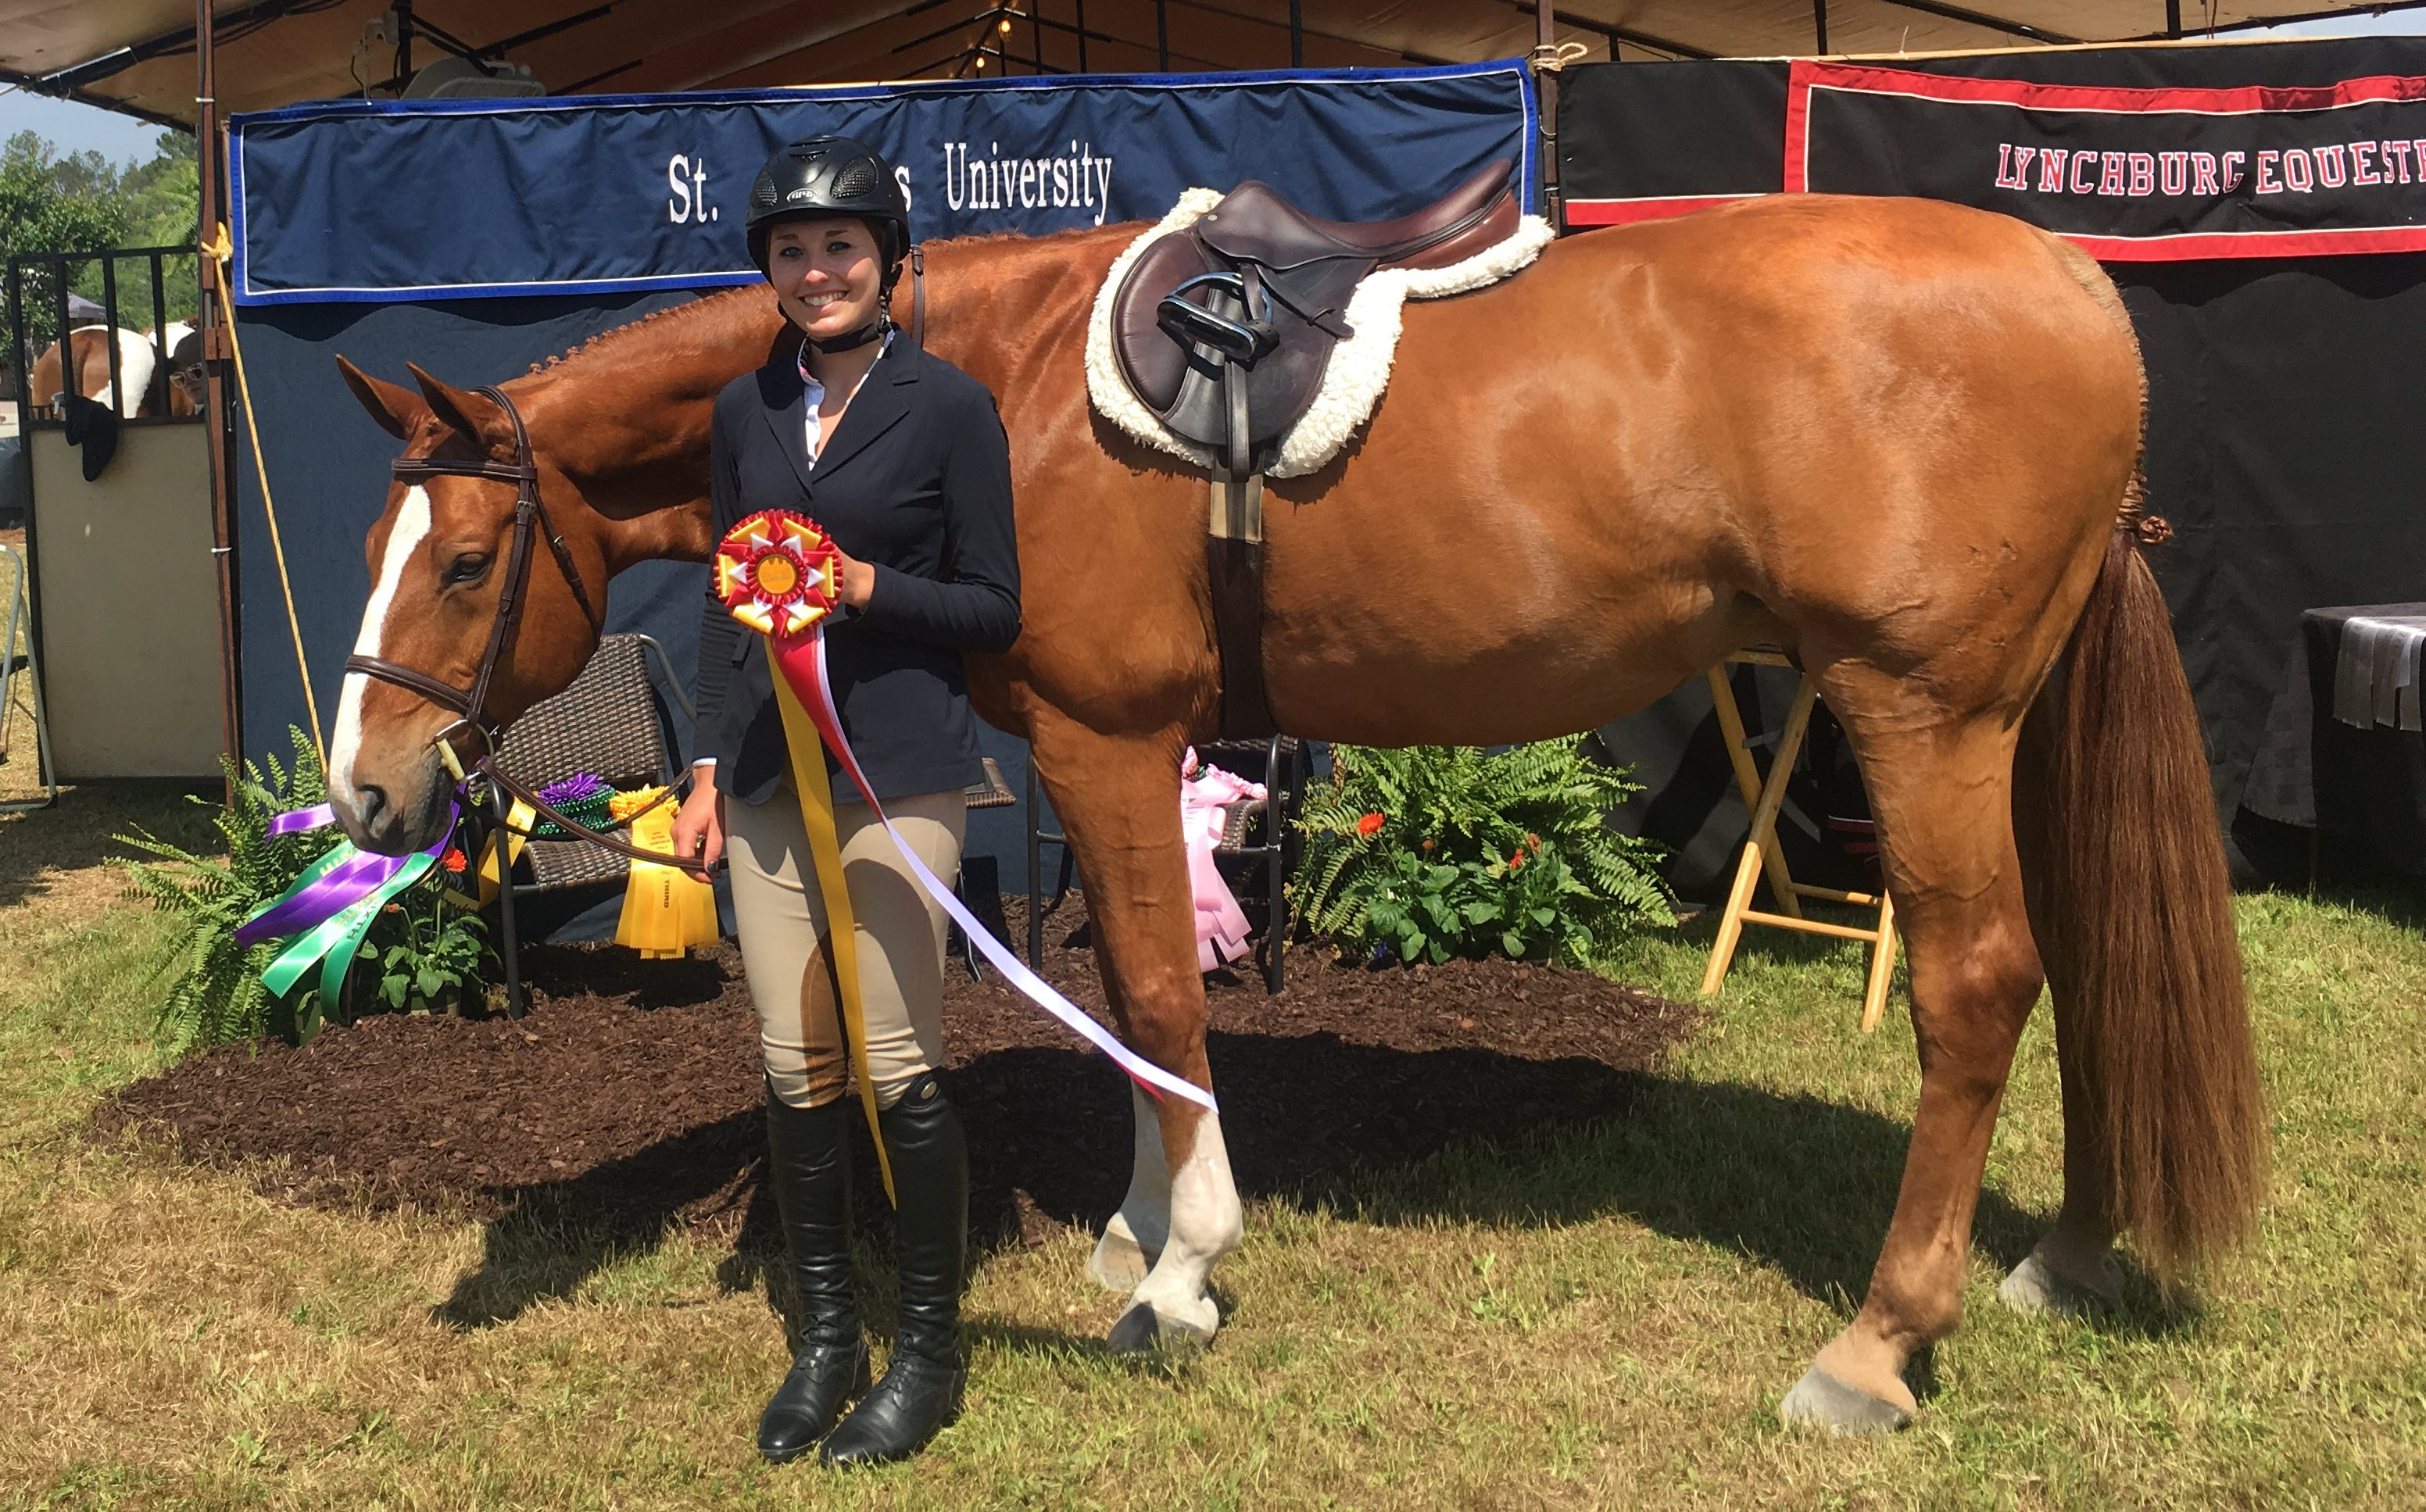 Sabrina V. Reserve Champion Rider Overall 2017